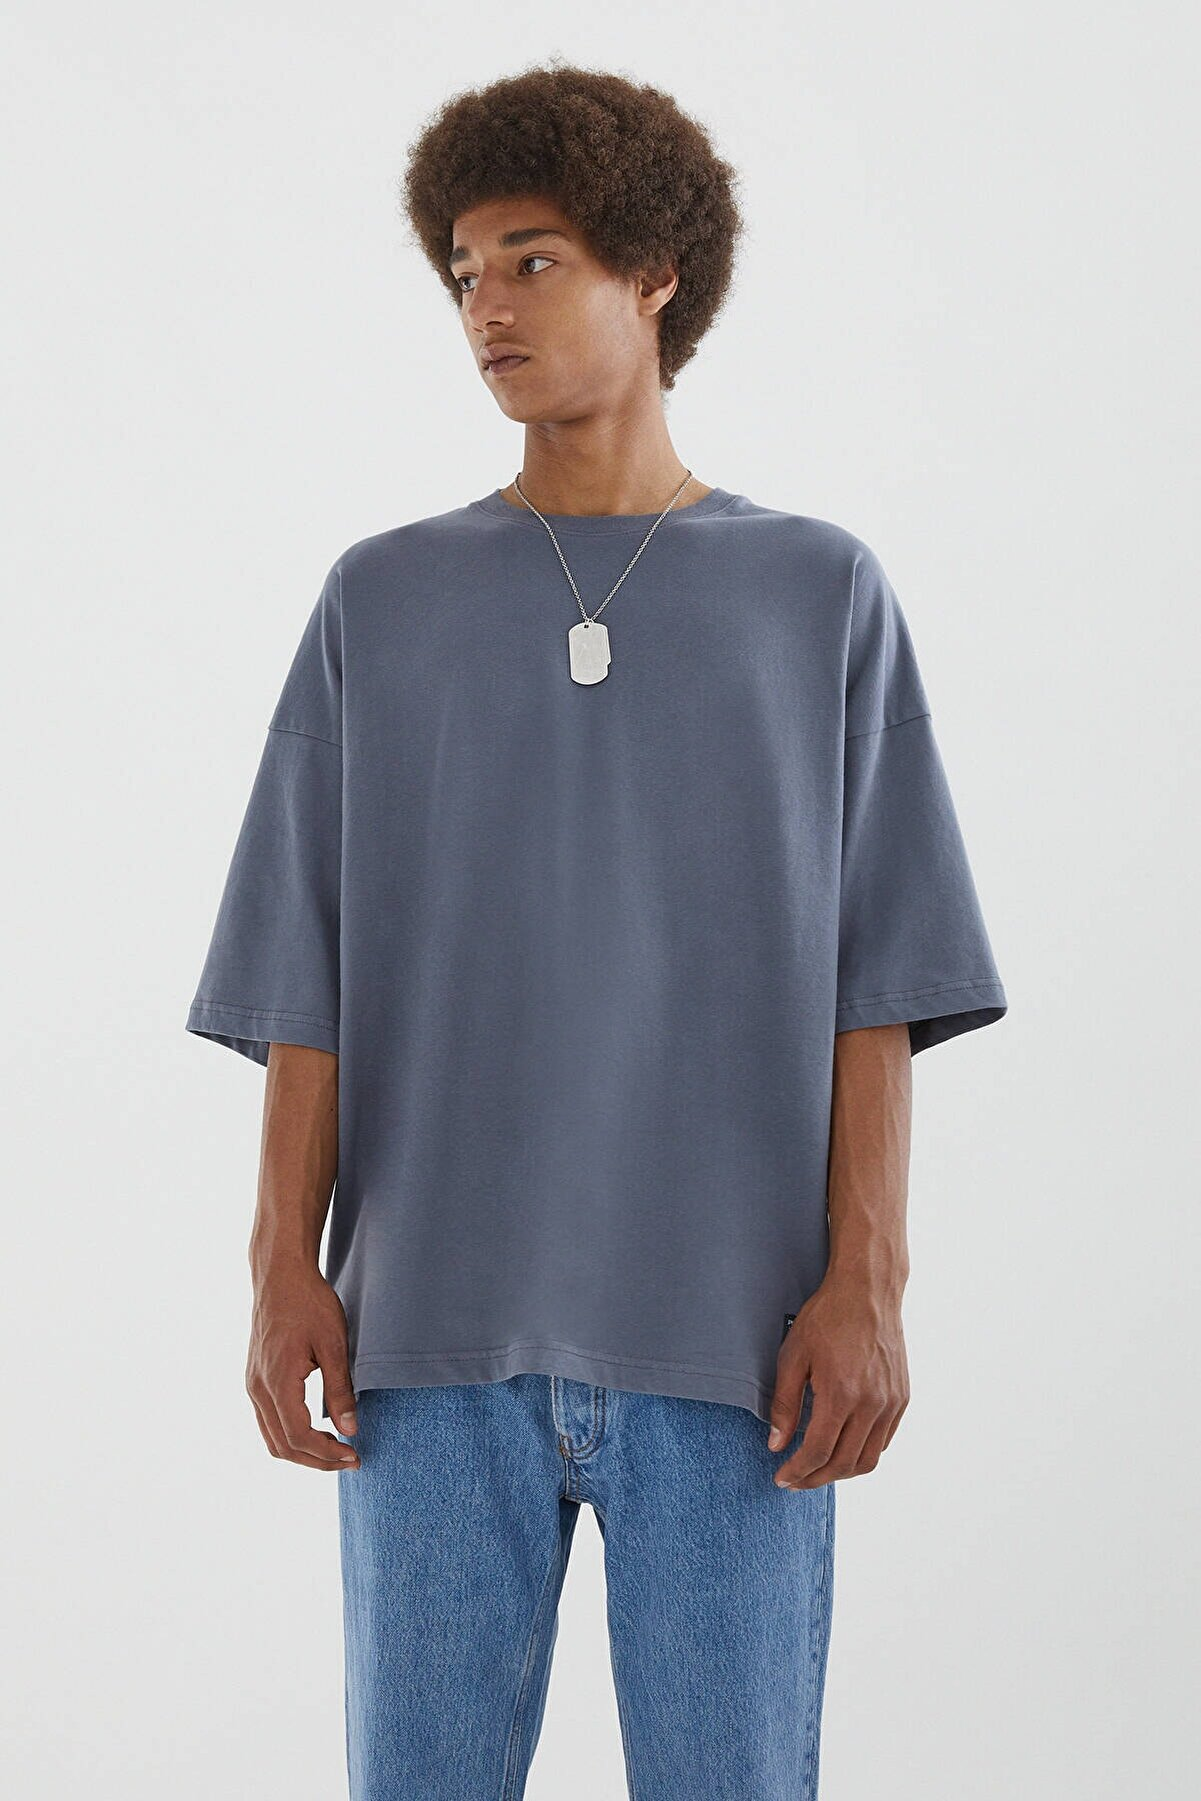 Pull & Bear Erkek Gri Basic Kısa Kollu Loose Fit T-shirt